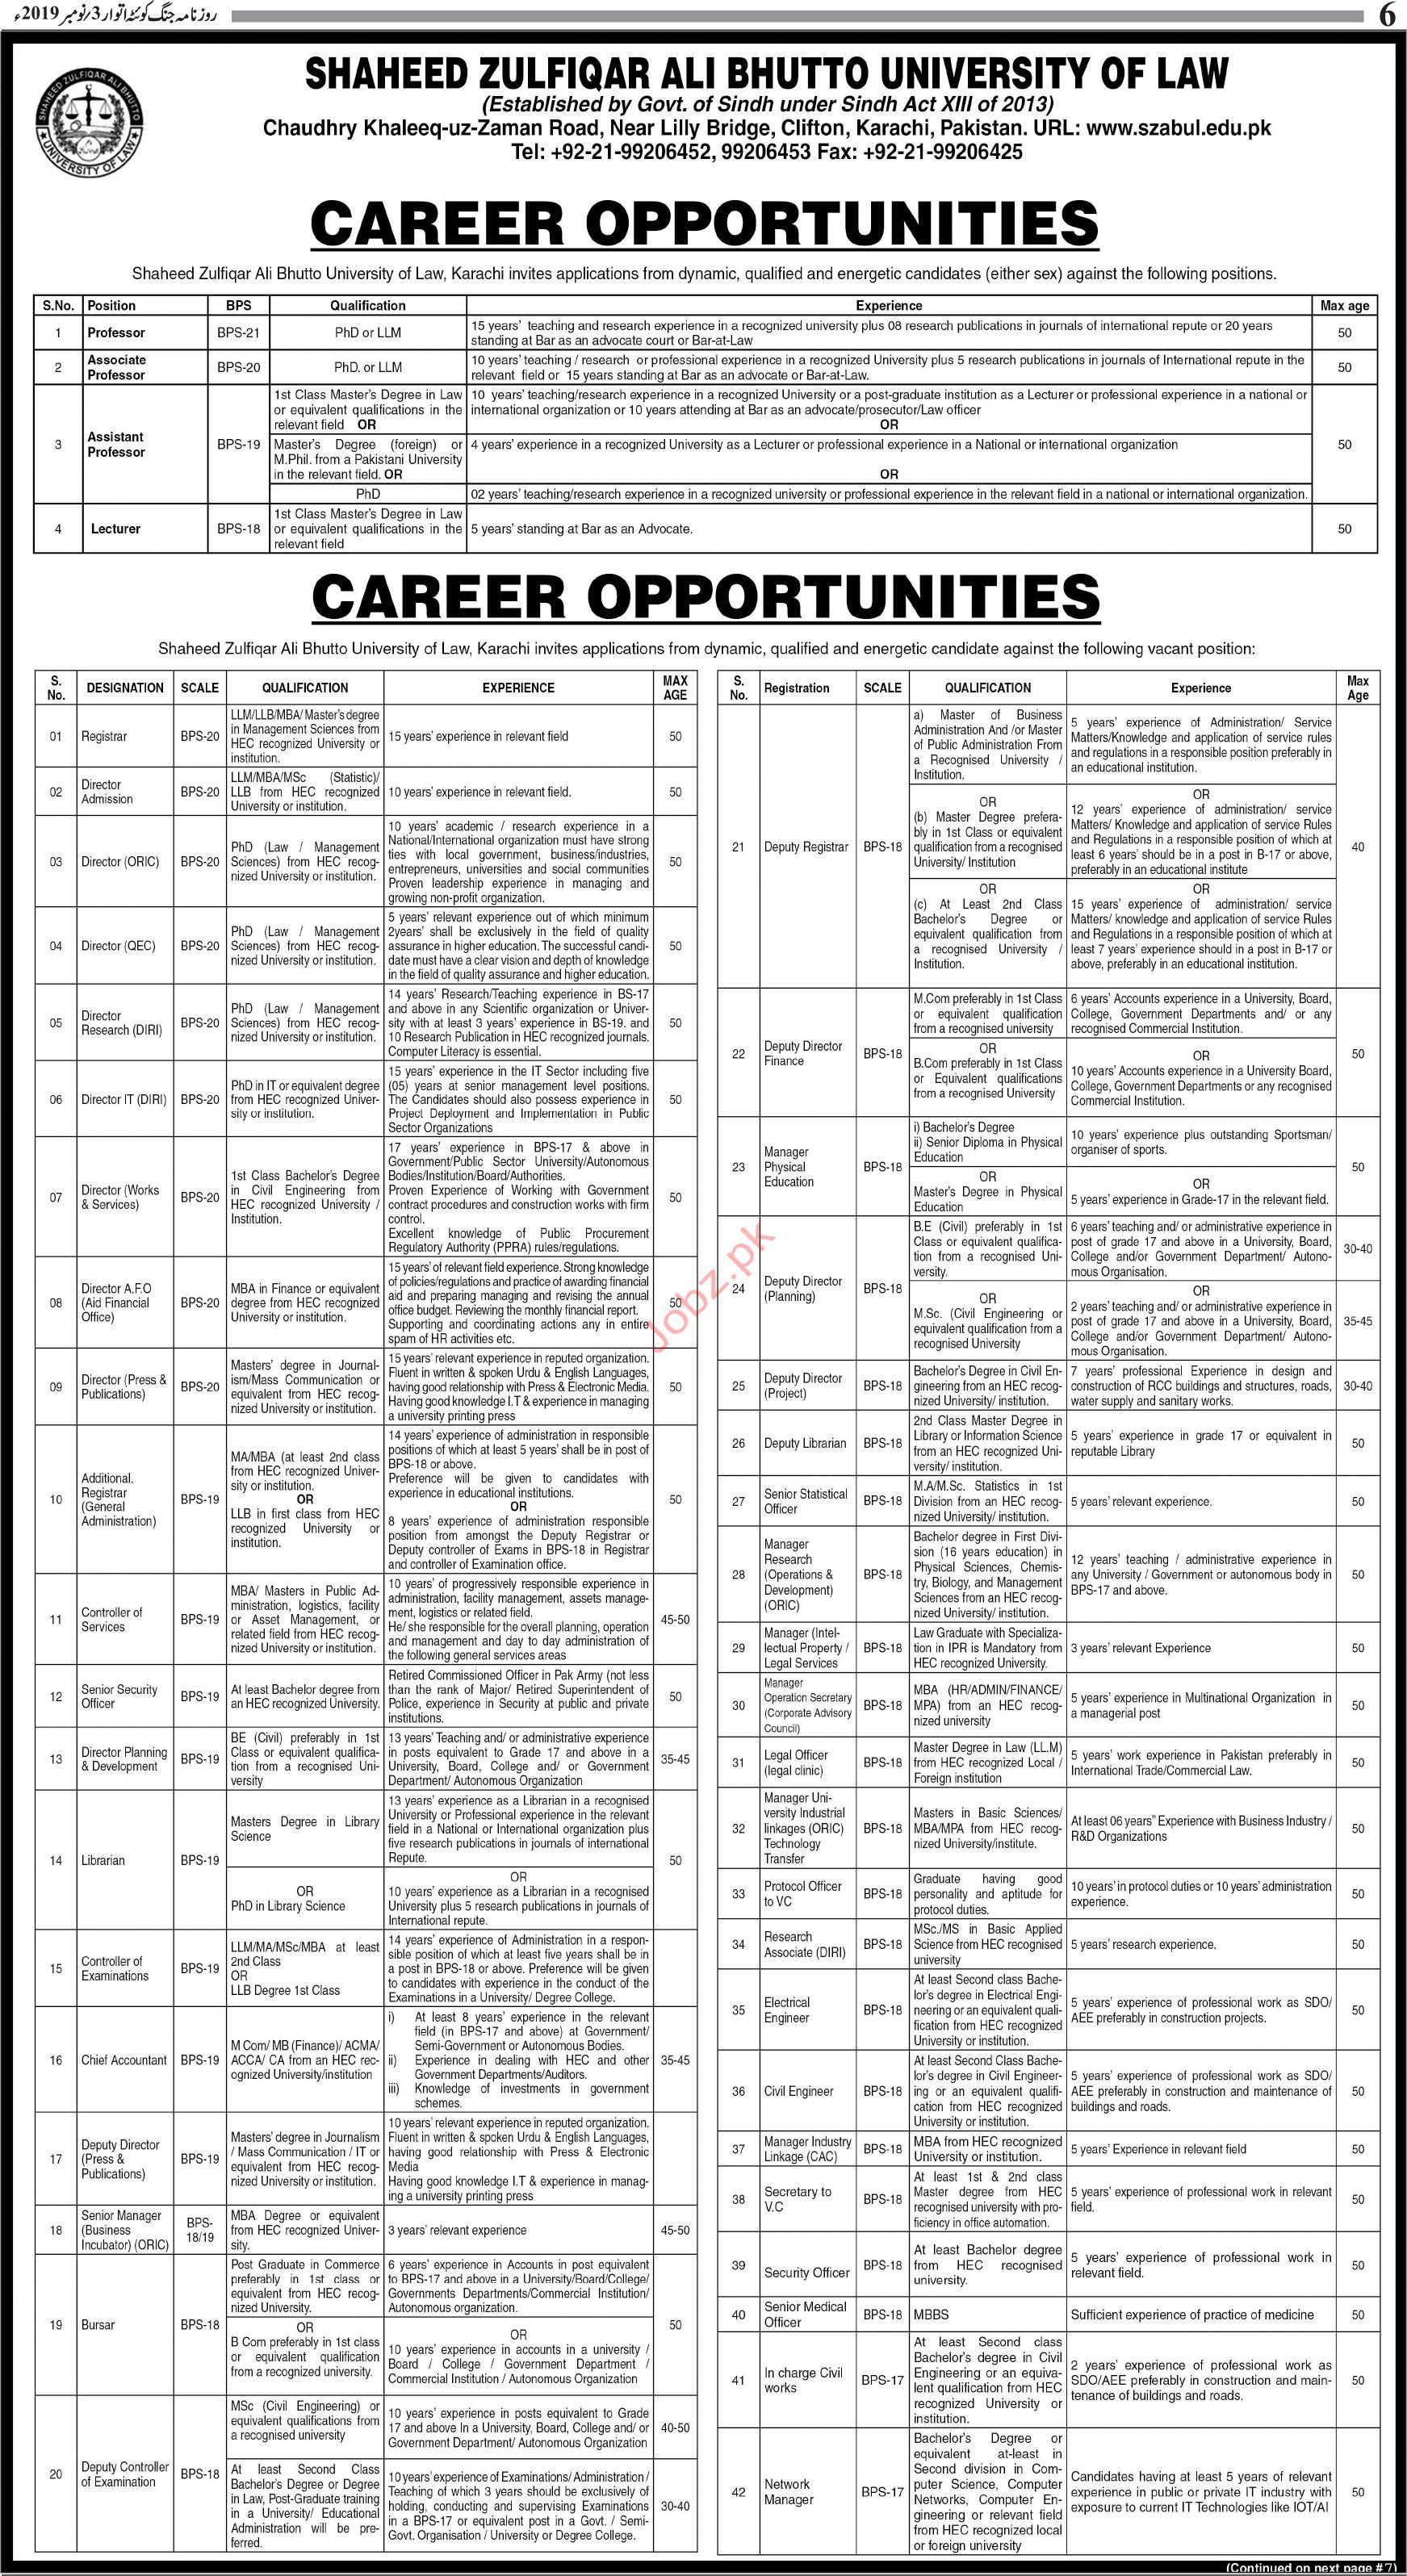 Shaheed Zulfikar Ali Bhutto University of Law Karachi Jobs